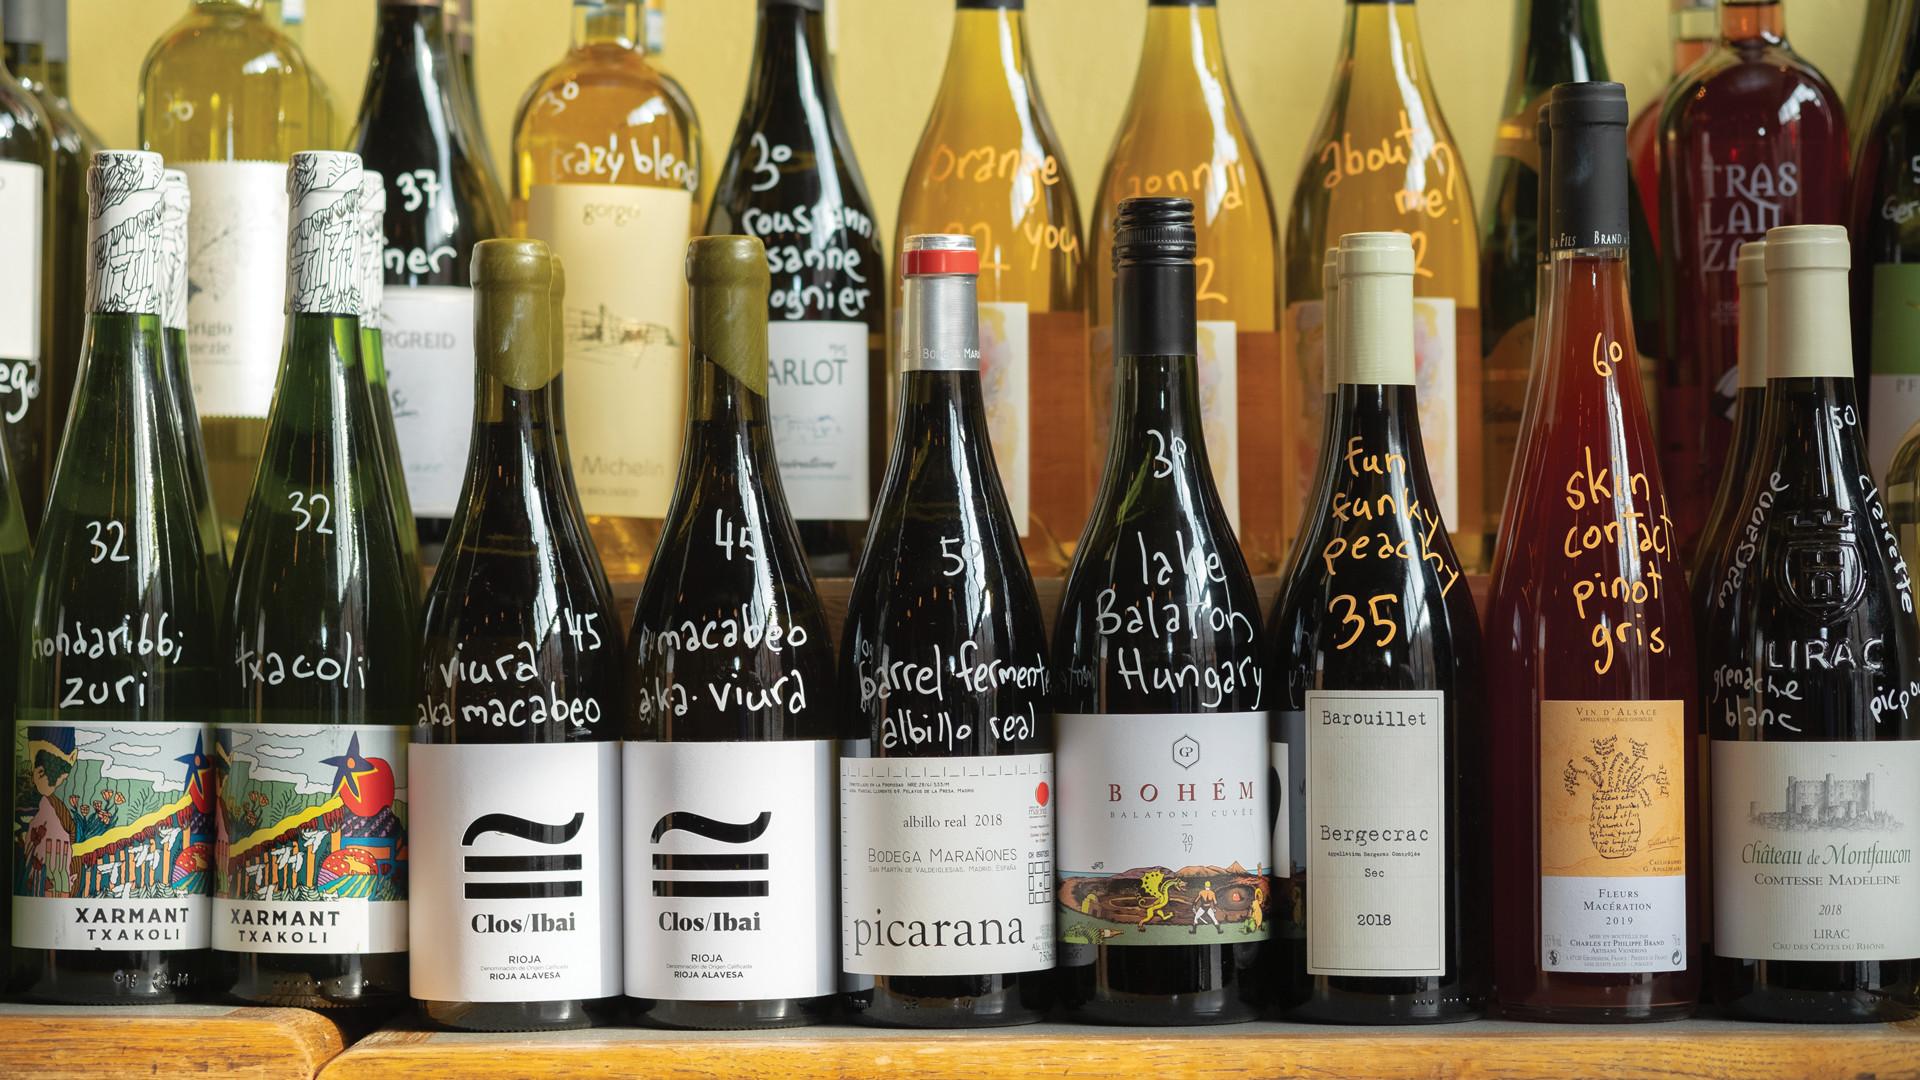 The best bottle shops in Toronto | Wine bottles at La Palette